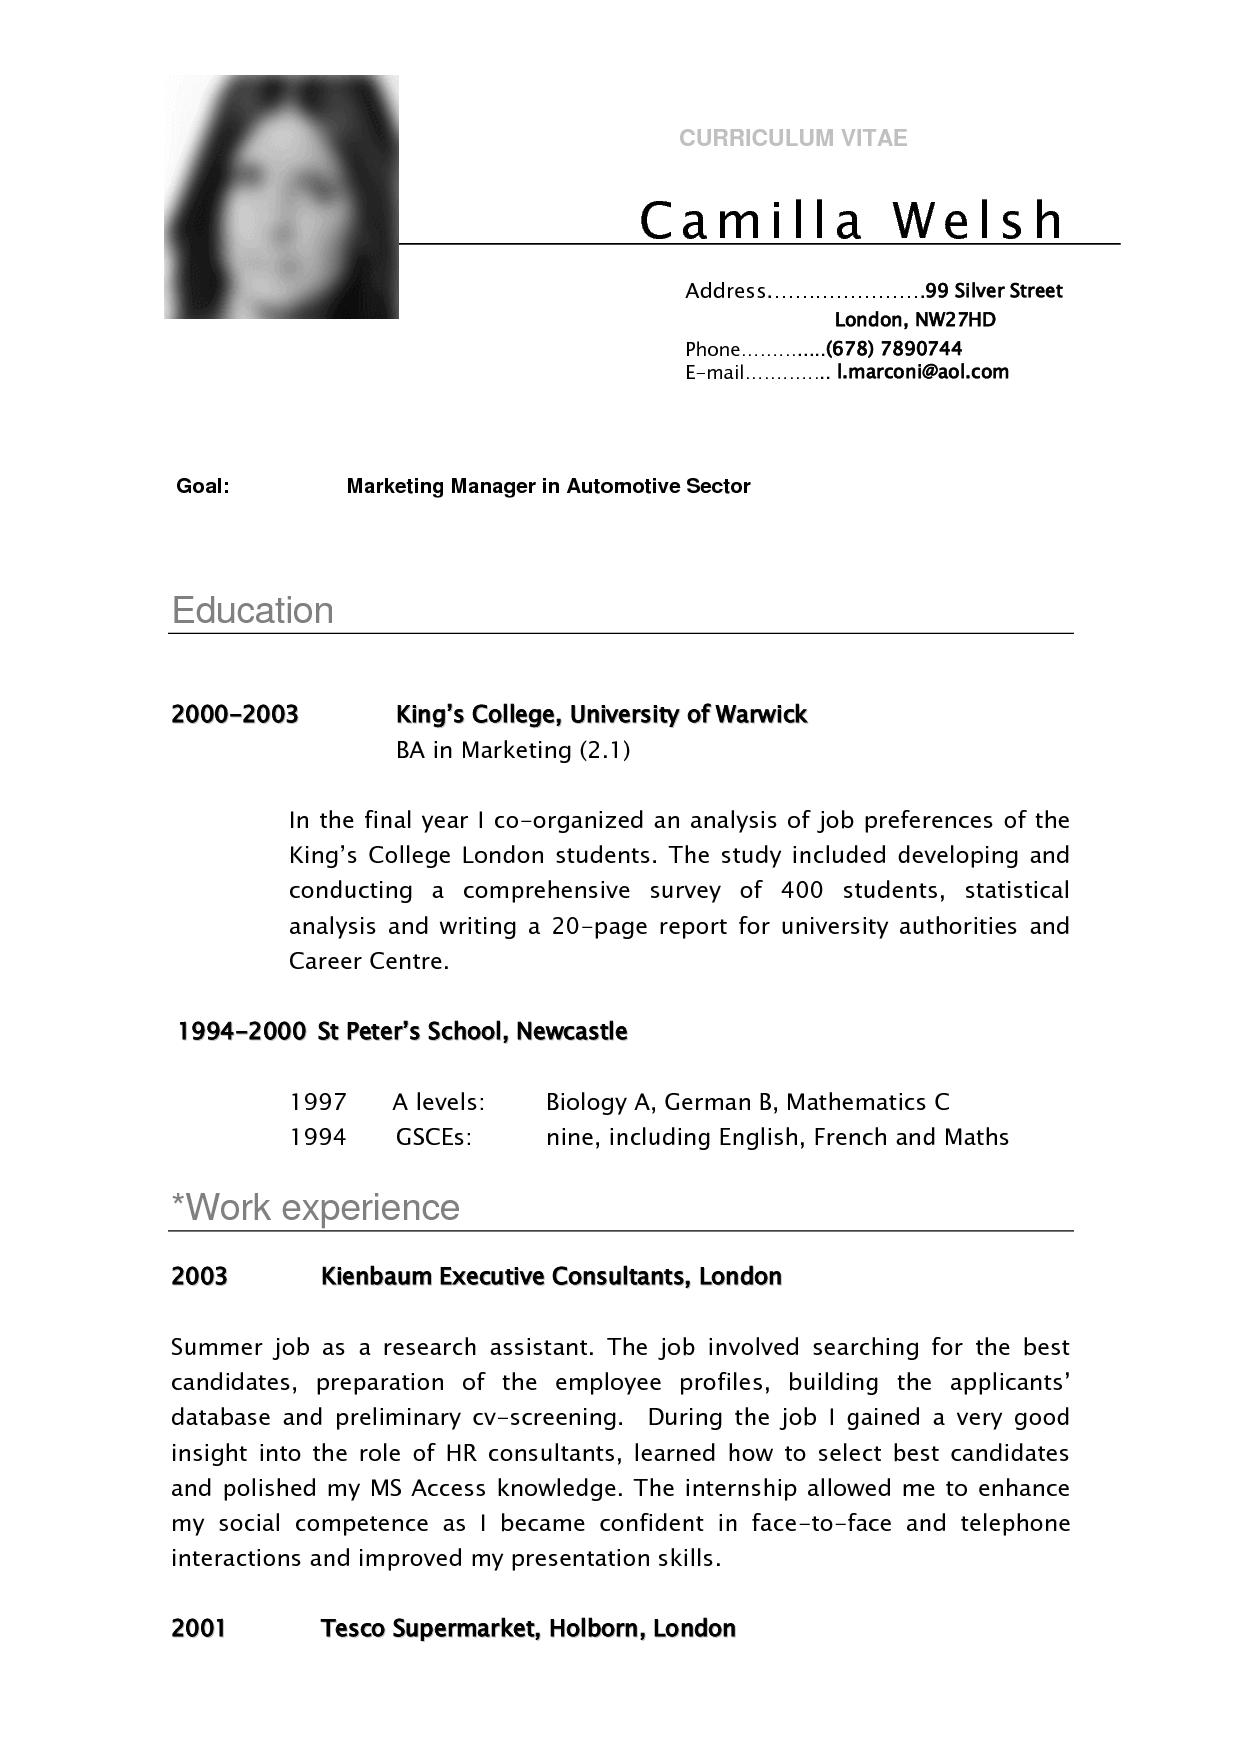 Merveilleux CV SAMPLE CURRICULUM VITAE Camilla